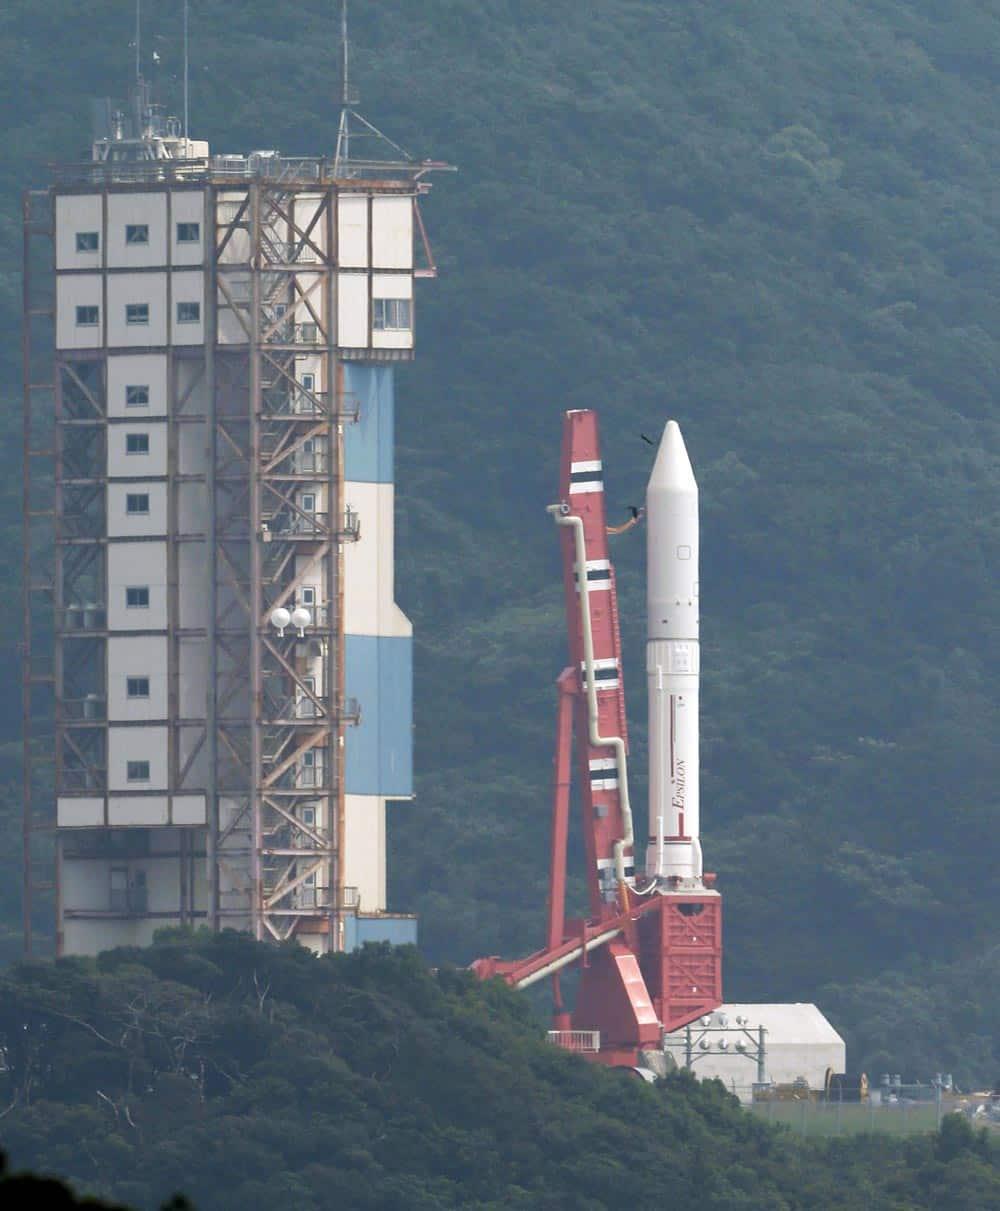 An Epsilon rocket sits on the launch pad at the Uchinoura Space Center in Kimotsuki town, Kagoshima, western Japan.